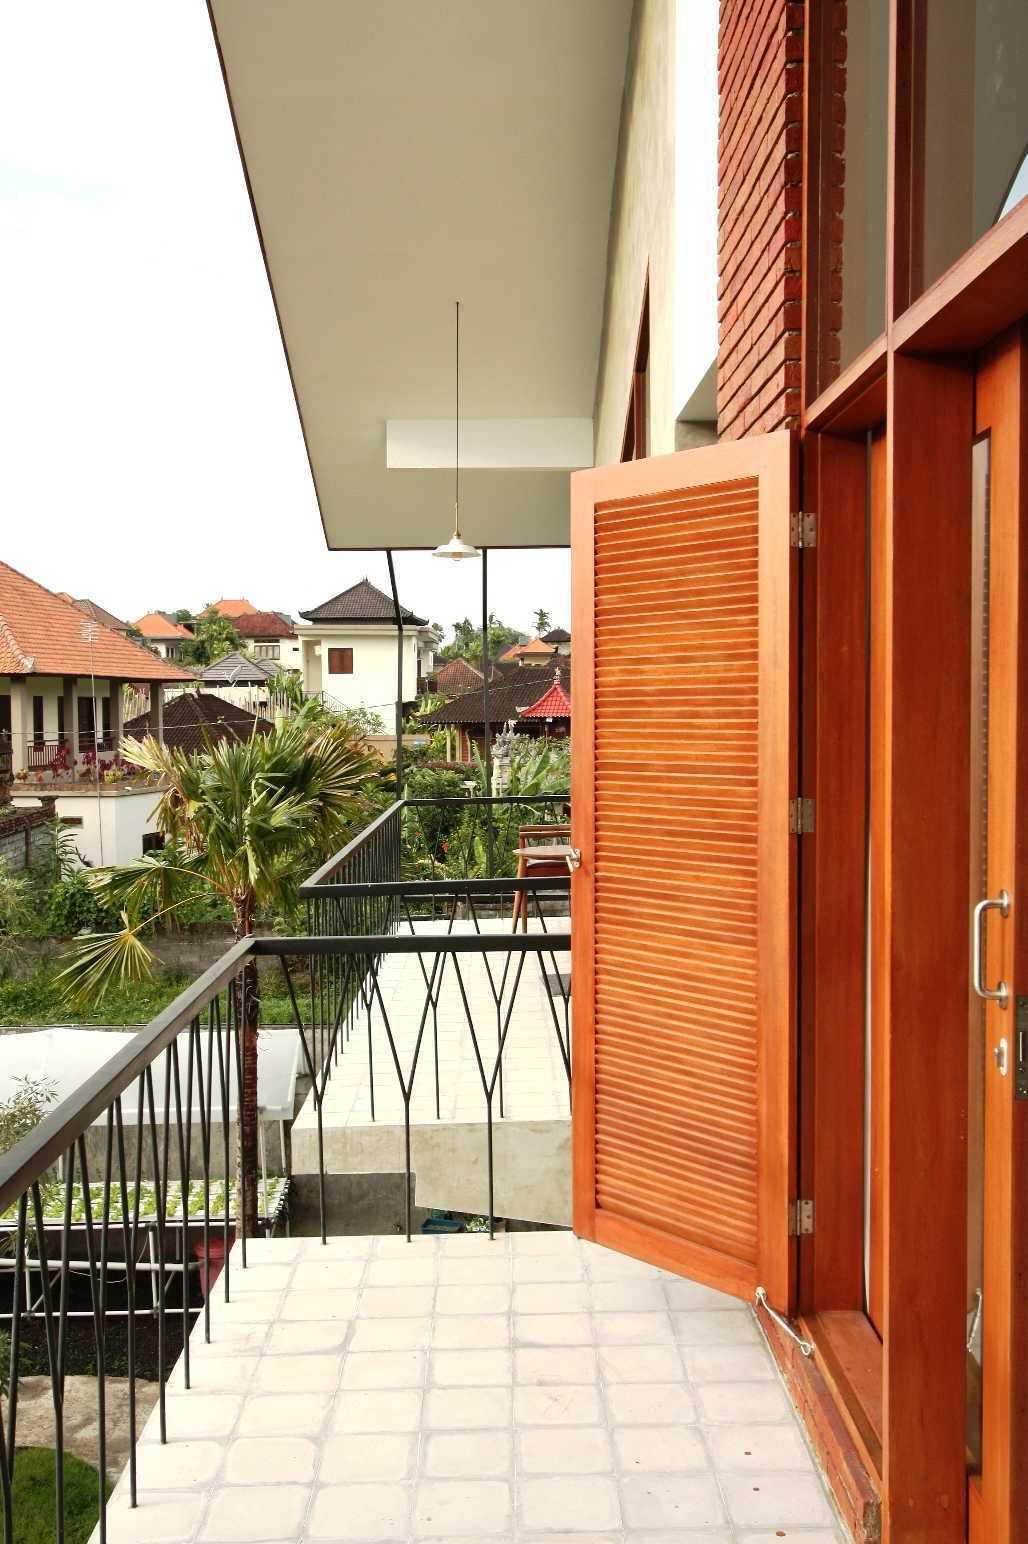 Ddap Architect Kubu Tropis Lodge Accommodation Ubud, Kabupaten Gianyar, Bali, Indonesia Bali Img0728 Tropis  28535